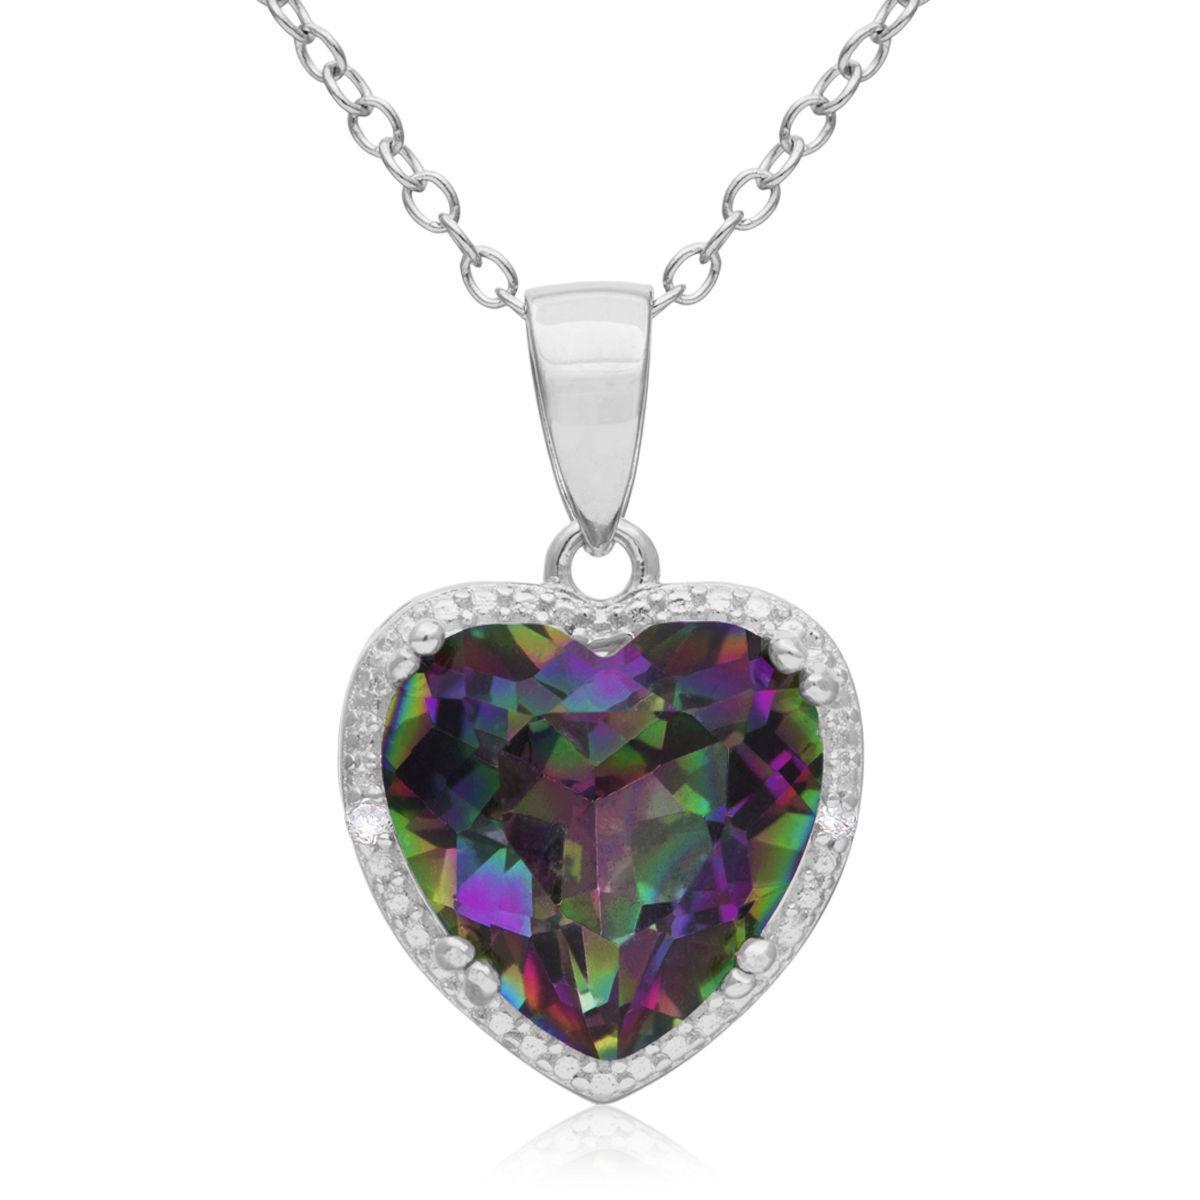 Woman Silver Love Heart Rainbow Mystical Topaz Gemstone Silver Necklace Pendant Fashion Jewelry